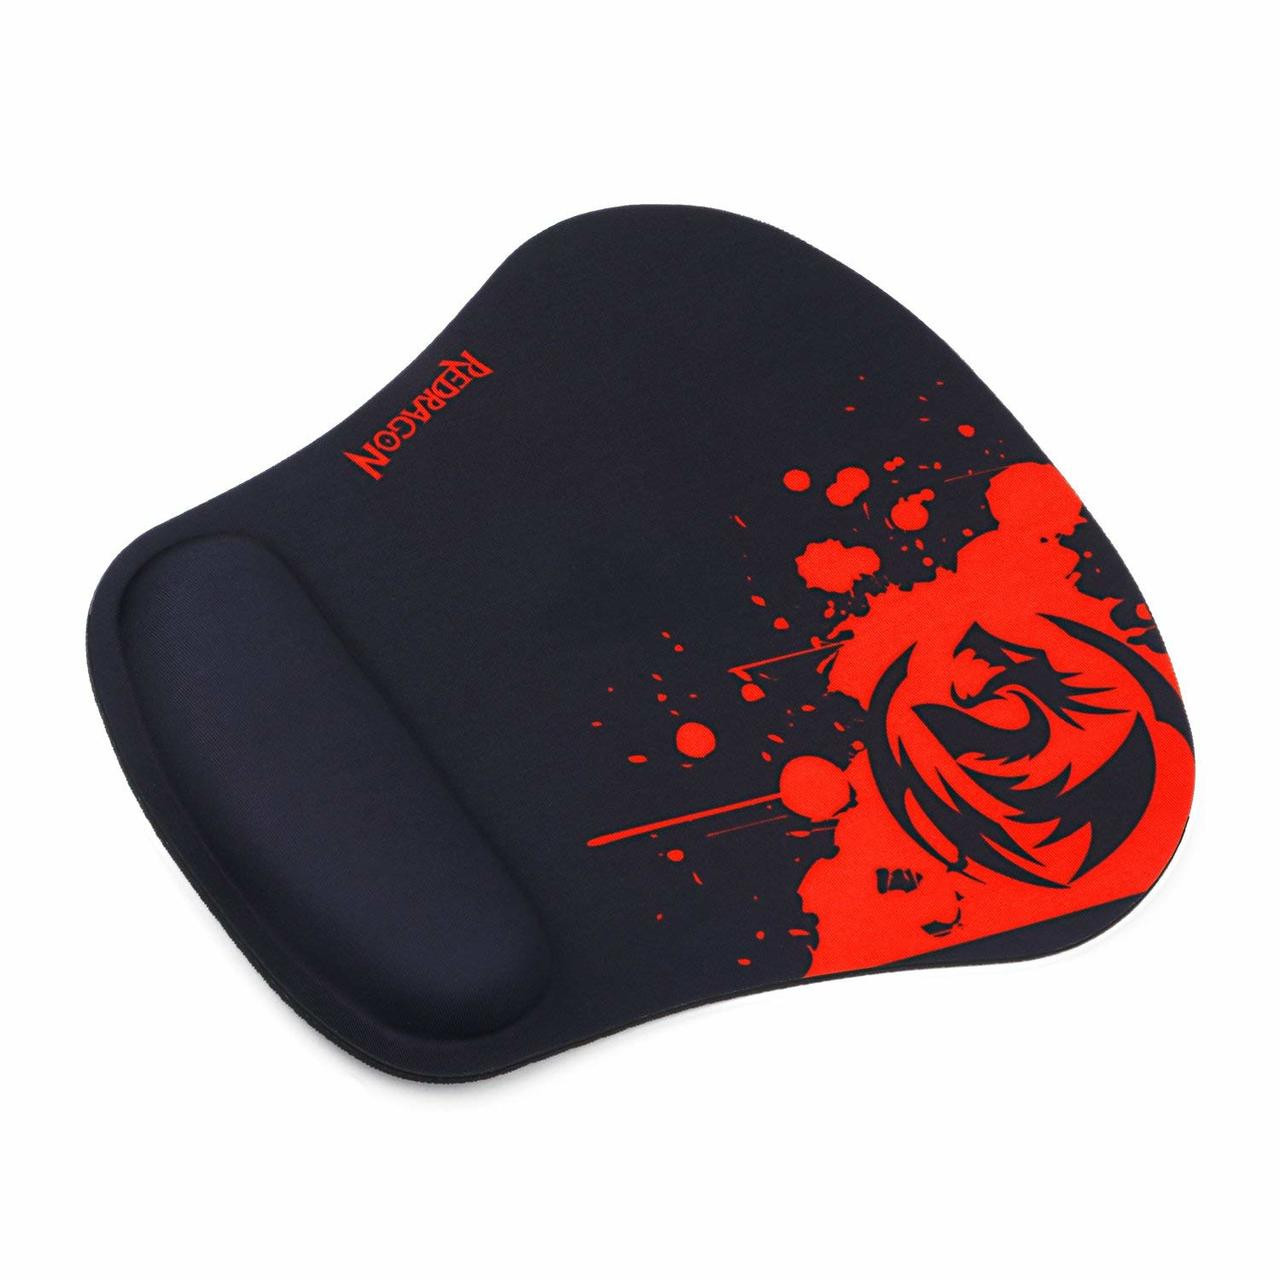 Black Quality Selection Comfortable Wrist Rest Mouse Pad